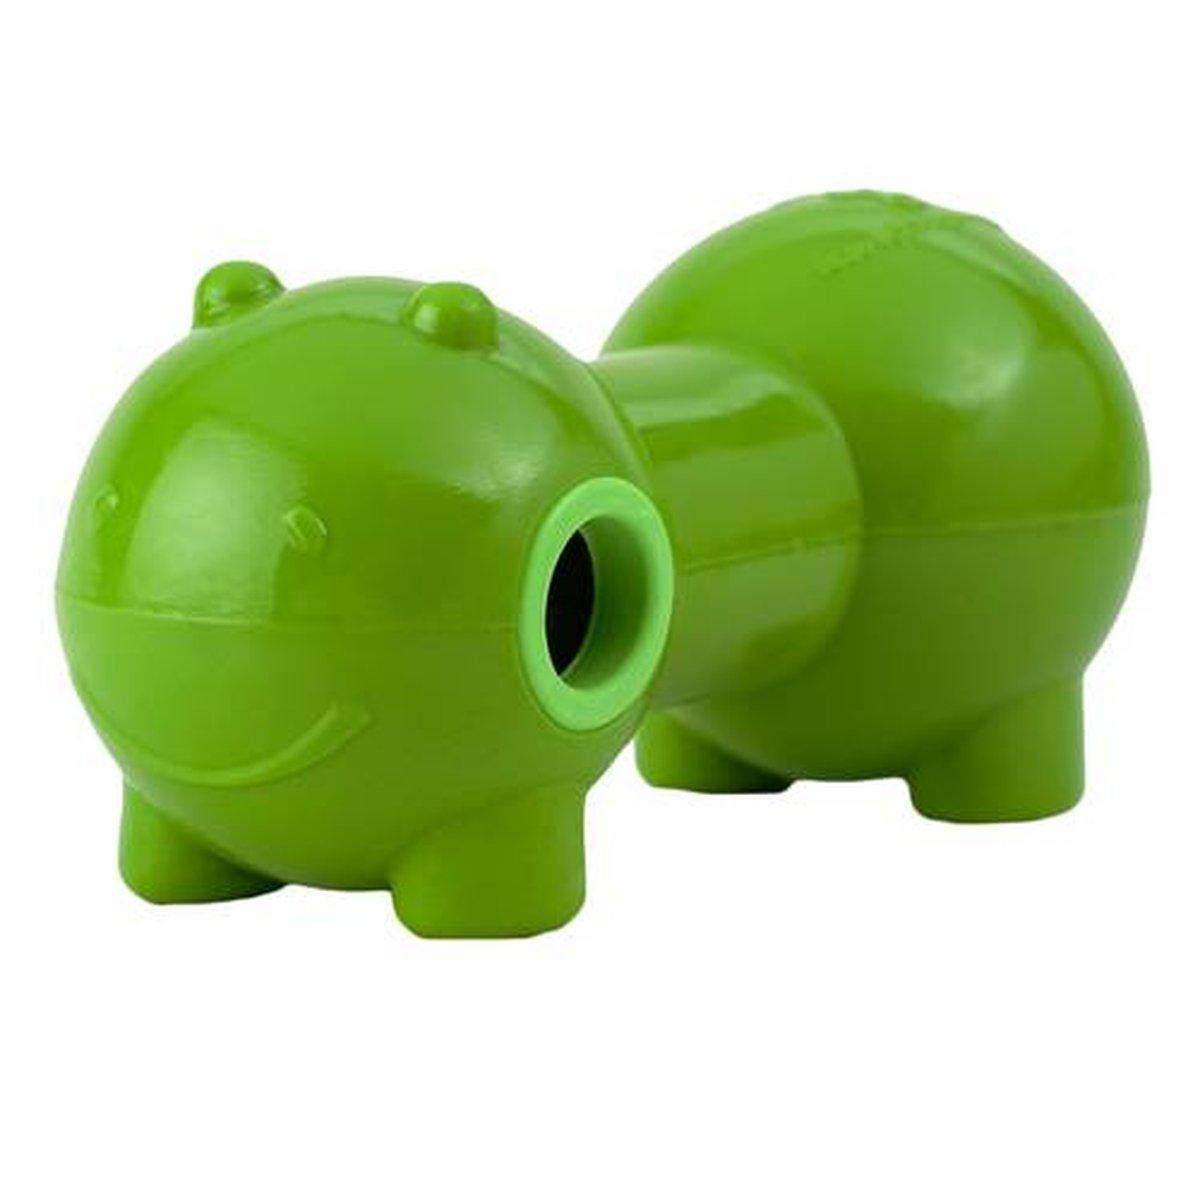 Afbeelding van Beba Toy Medium Green 1 st